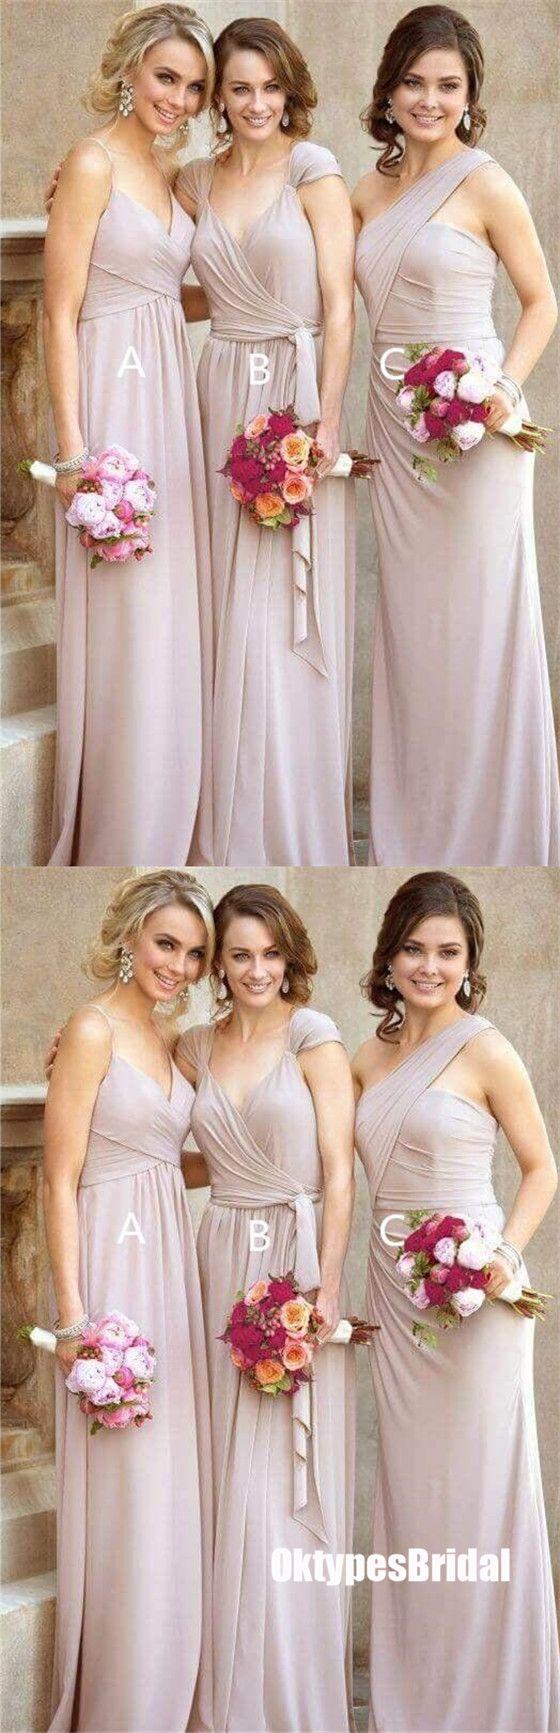 best bridesmaid dresses storenvy images on pinterest